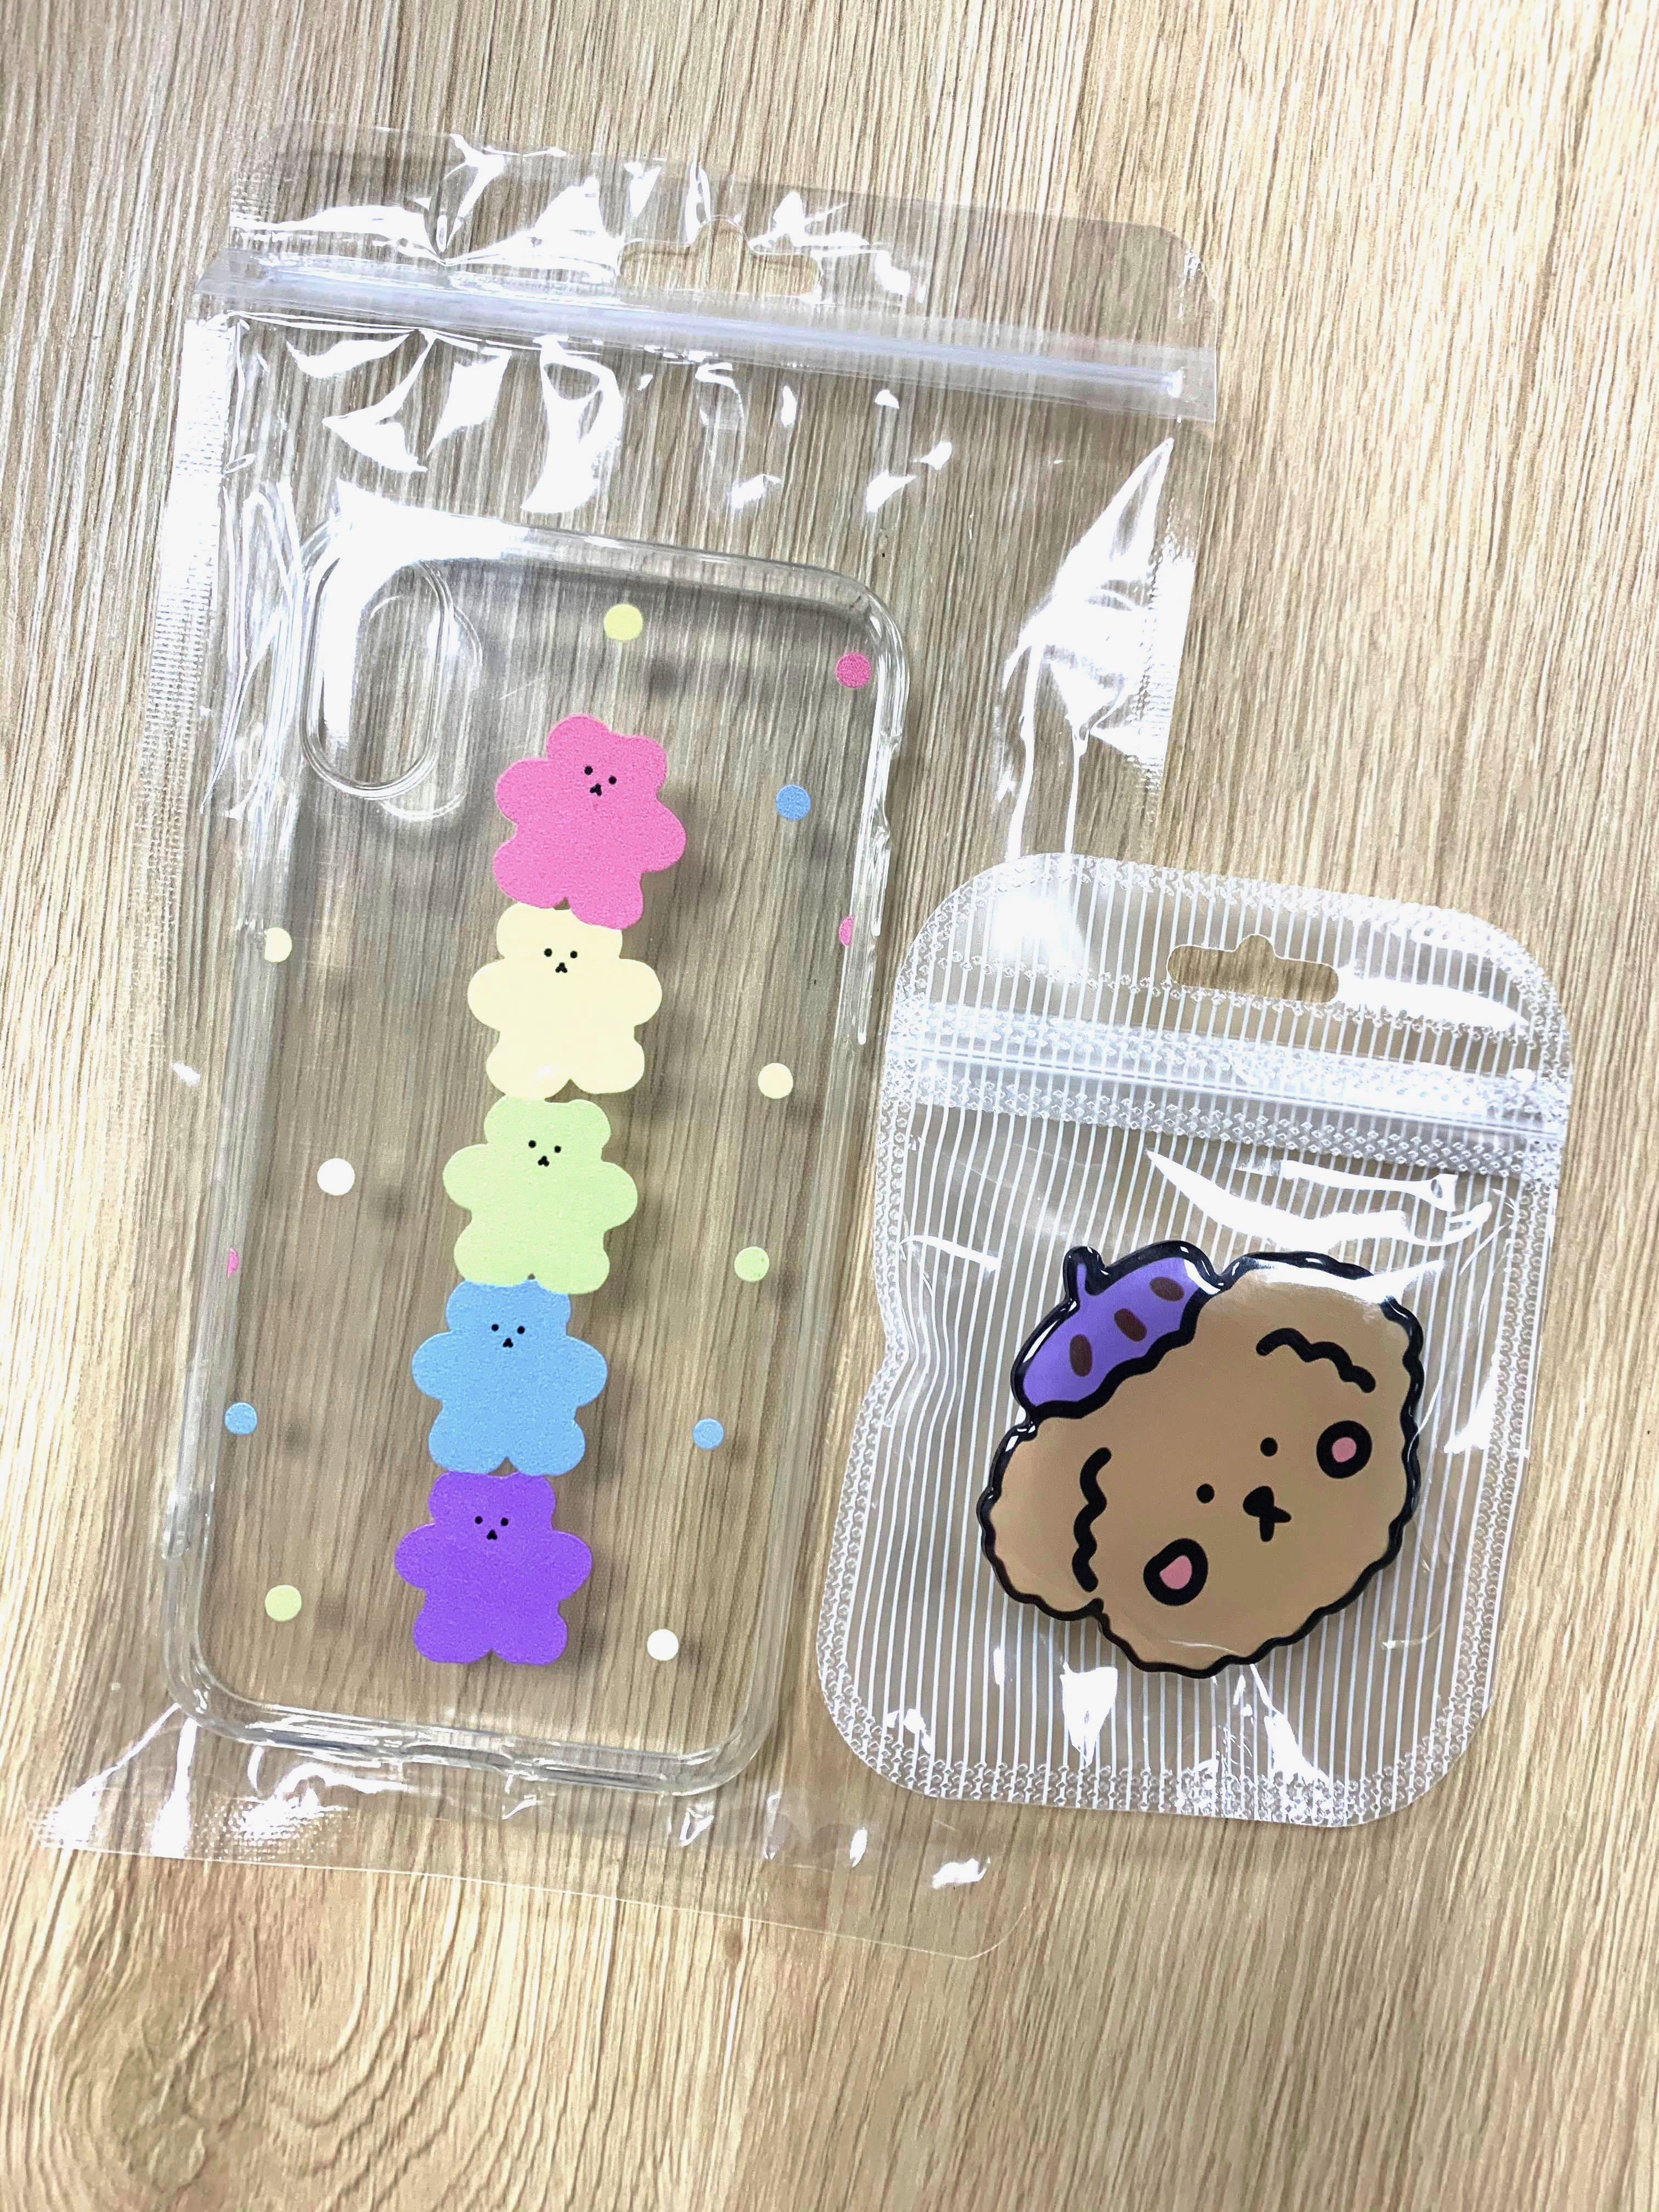 iPhone X/Xs 可愛手機殼+紫帽小熊折疊支架